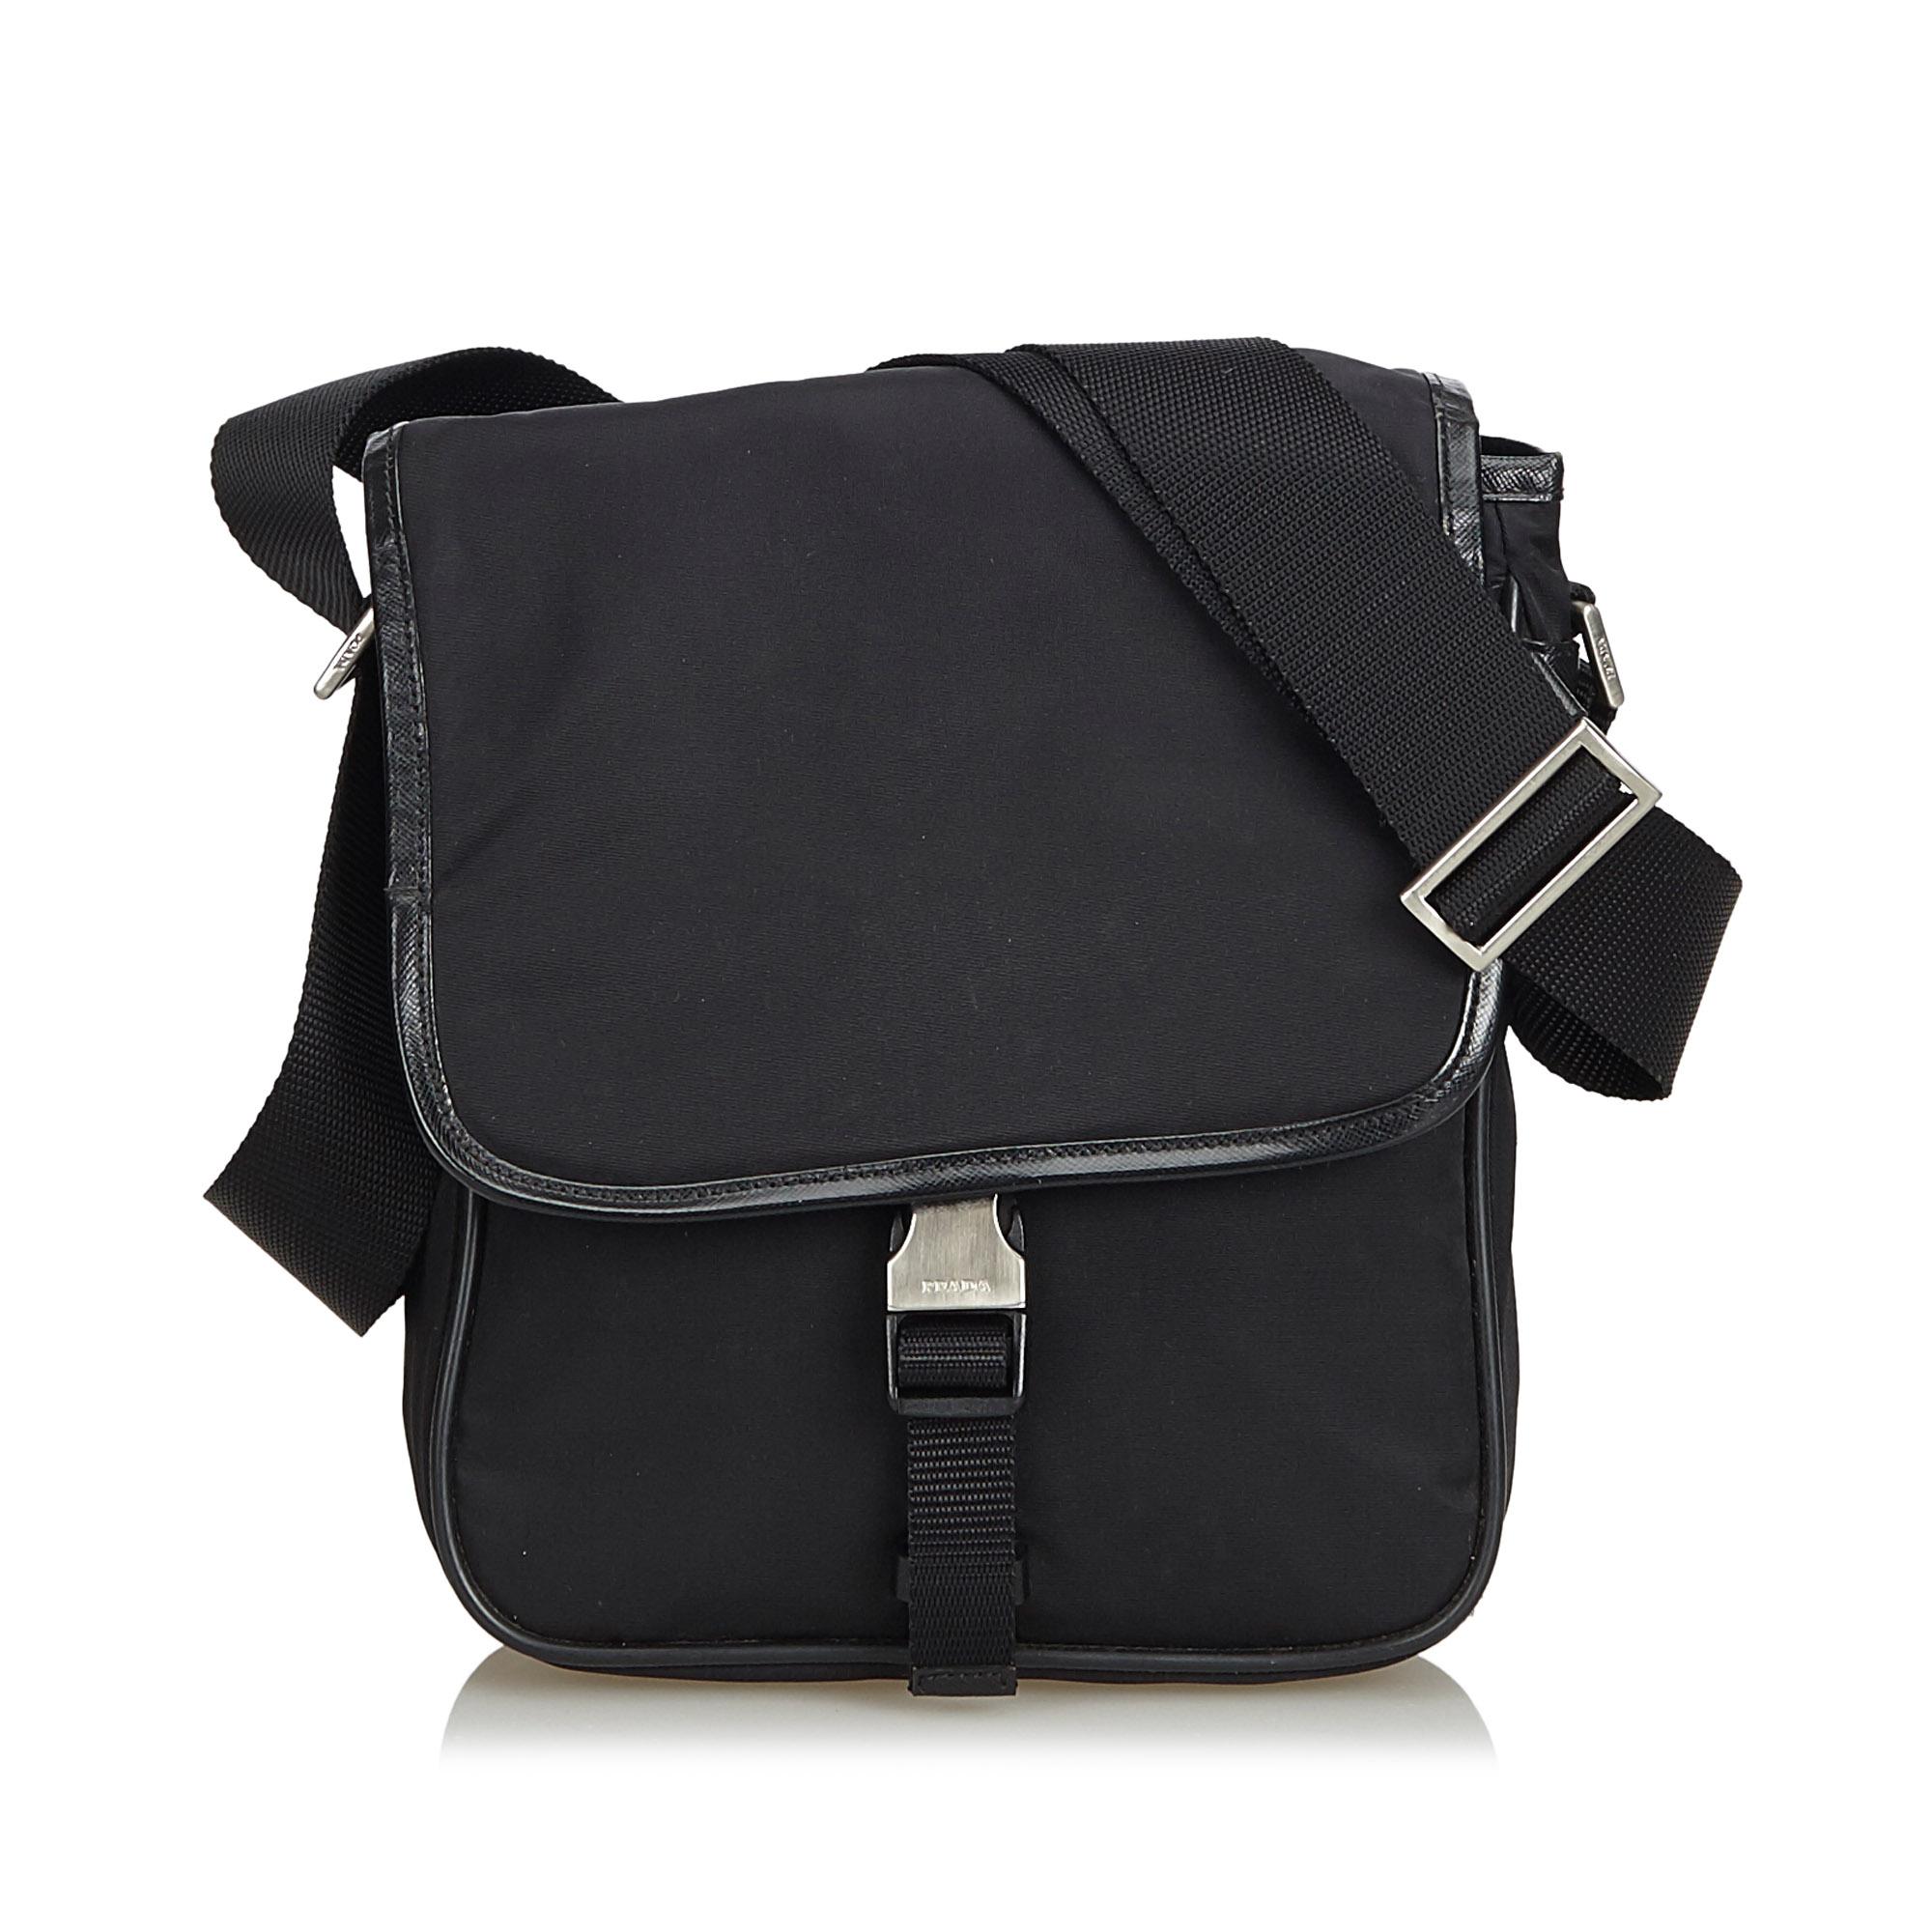 bb7d3398f9 VINTAGE PRADA BLACK Nylon Fabric Crossbody Bag Italy - $349.00 ...